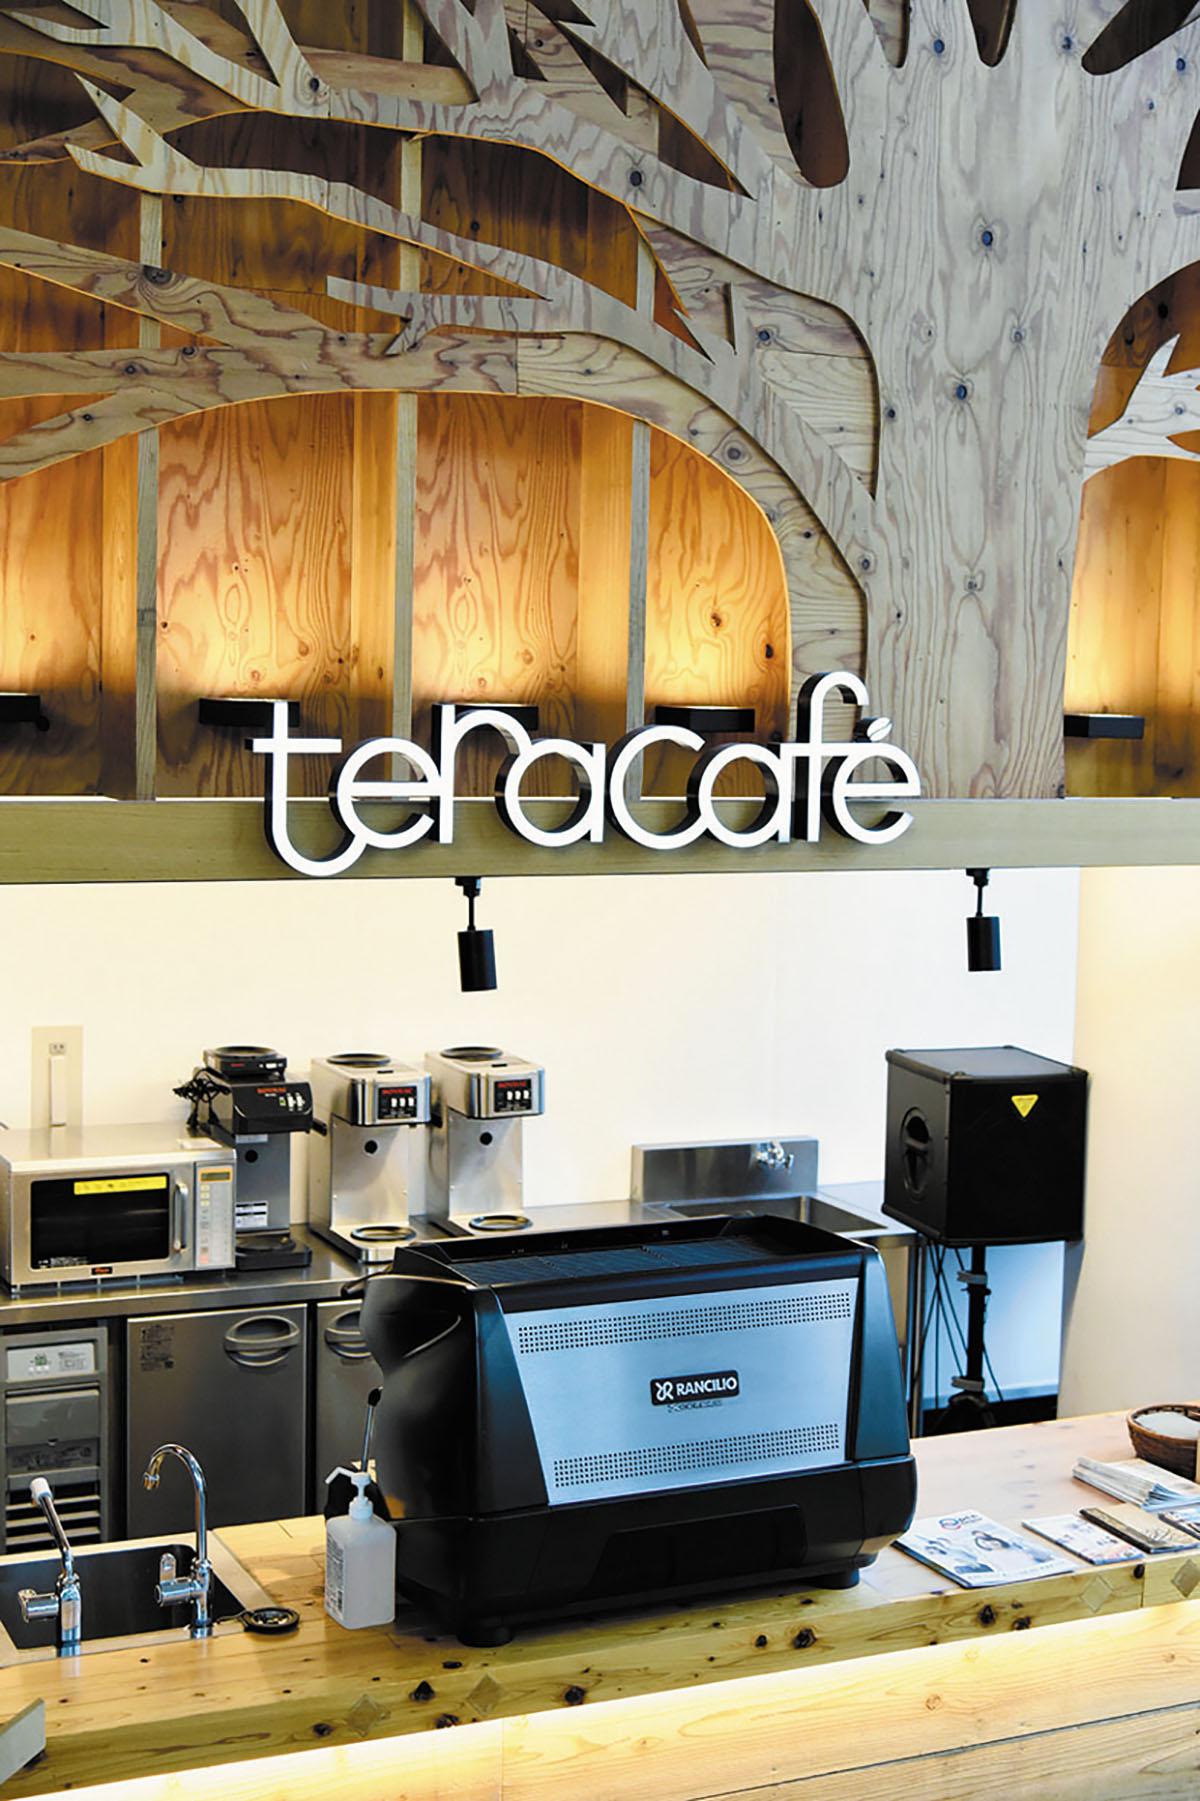 TeraCafe 東京テクニカルカレッジ店舗写真